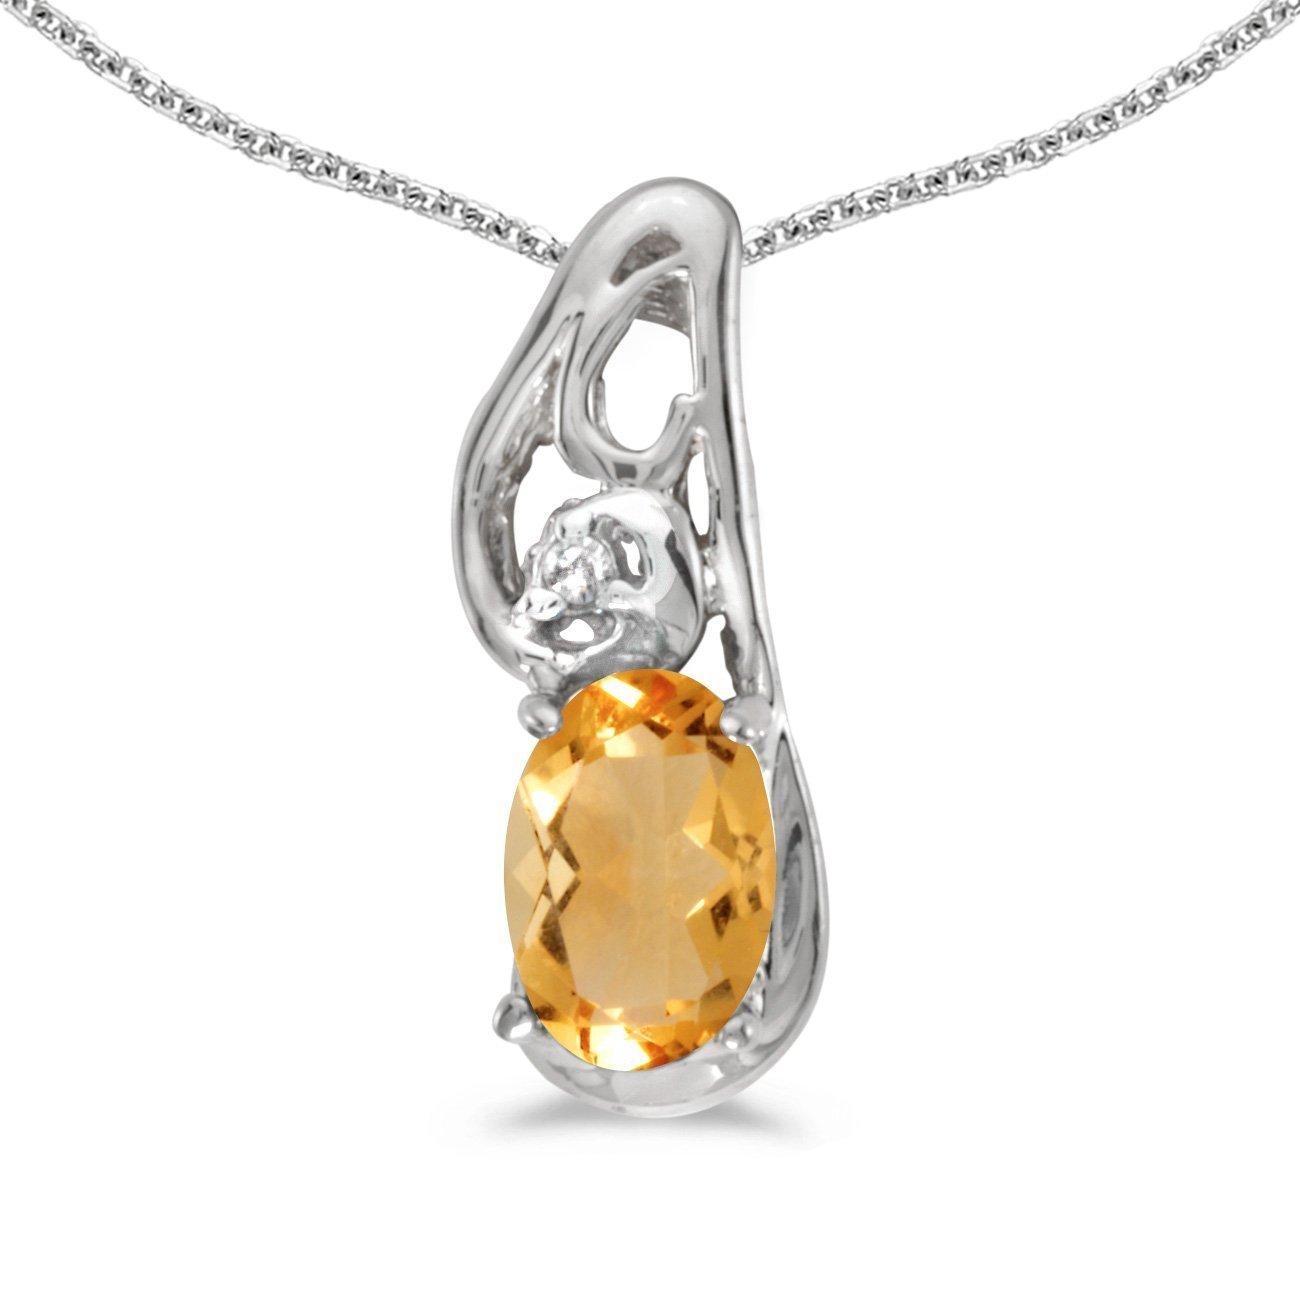 0.47 Cttw. FB Jewels Solid 10k White Gold Genuine Birthstone Oval Gemstone And Diamond Pendant